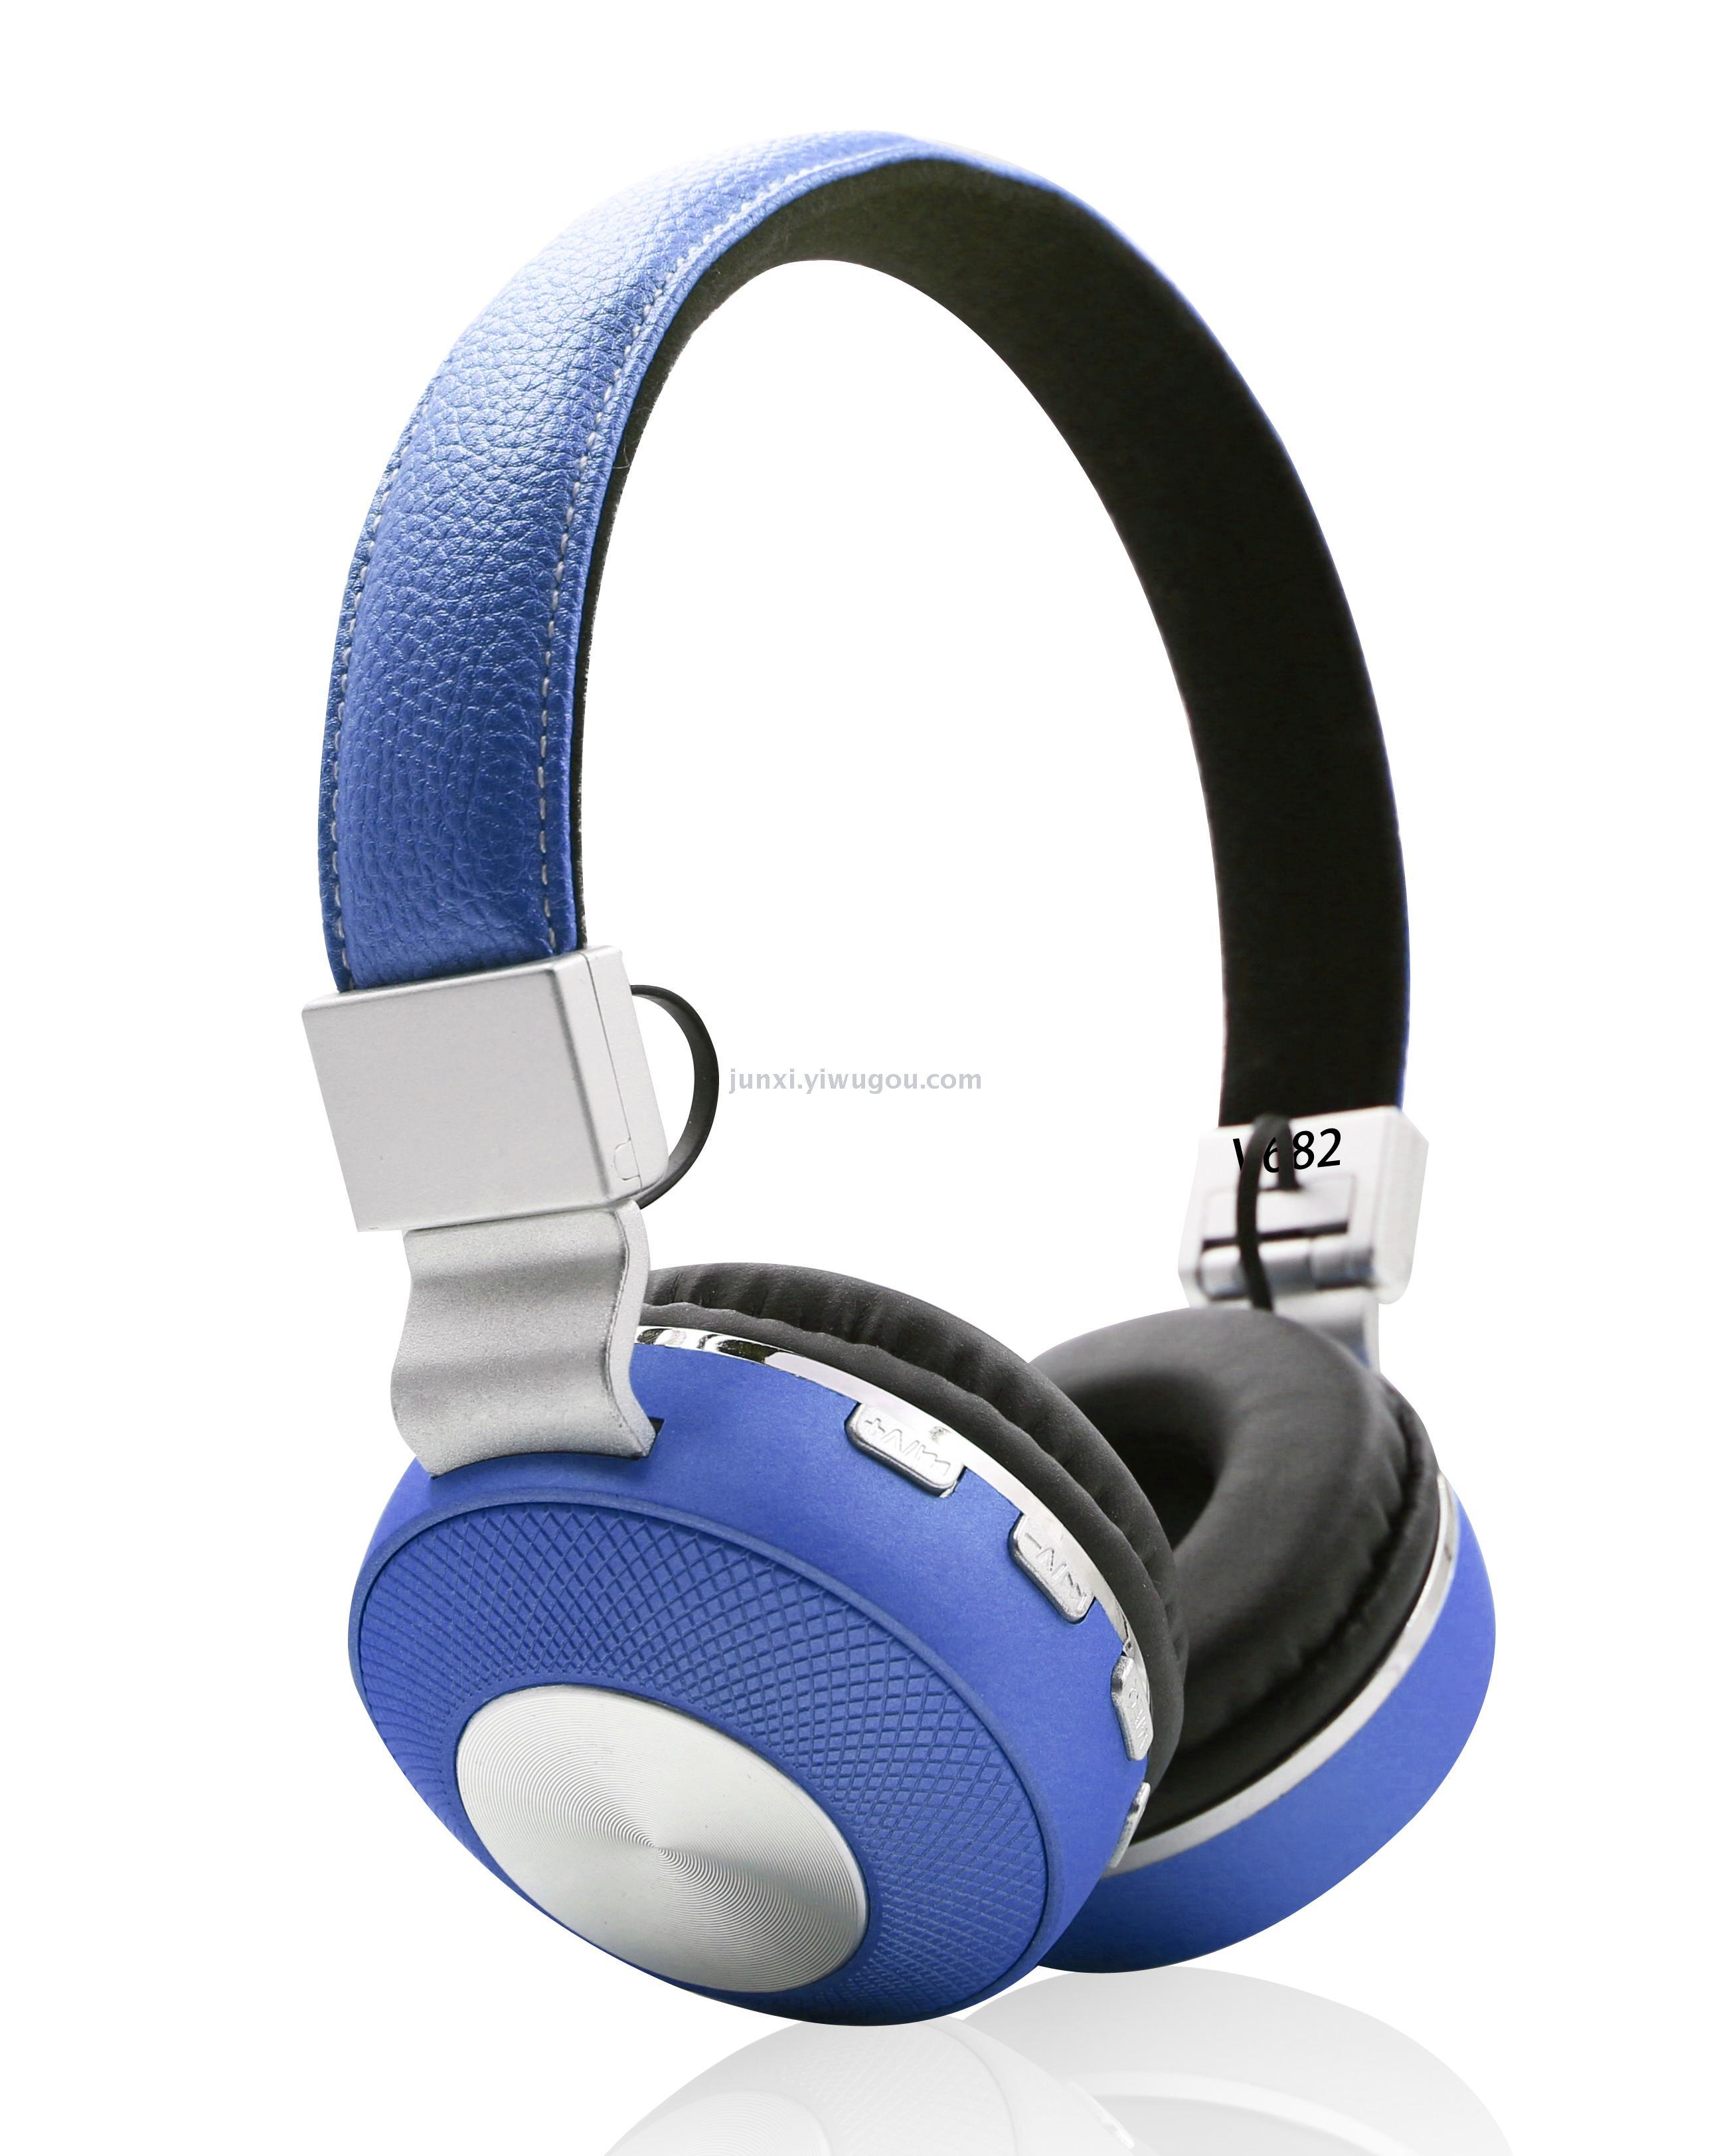 Supply Wireless Luminescent Bluetooth Headset Headset Headset Sports Running Headset Pc Phone Universal Ultra Long Standby